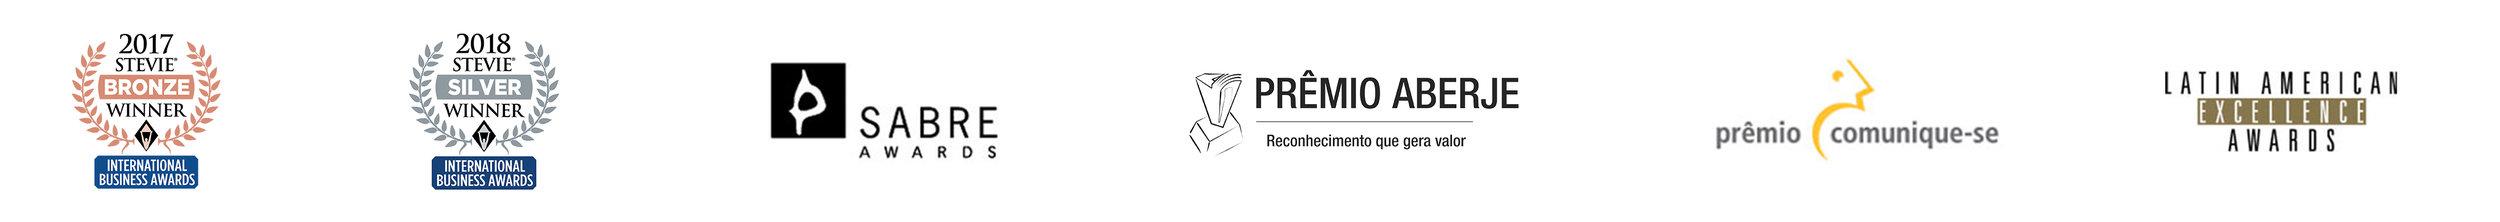 Premios2018_2.jpg